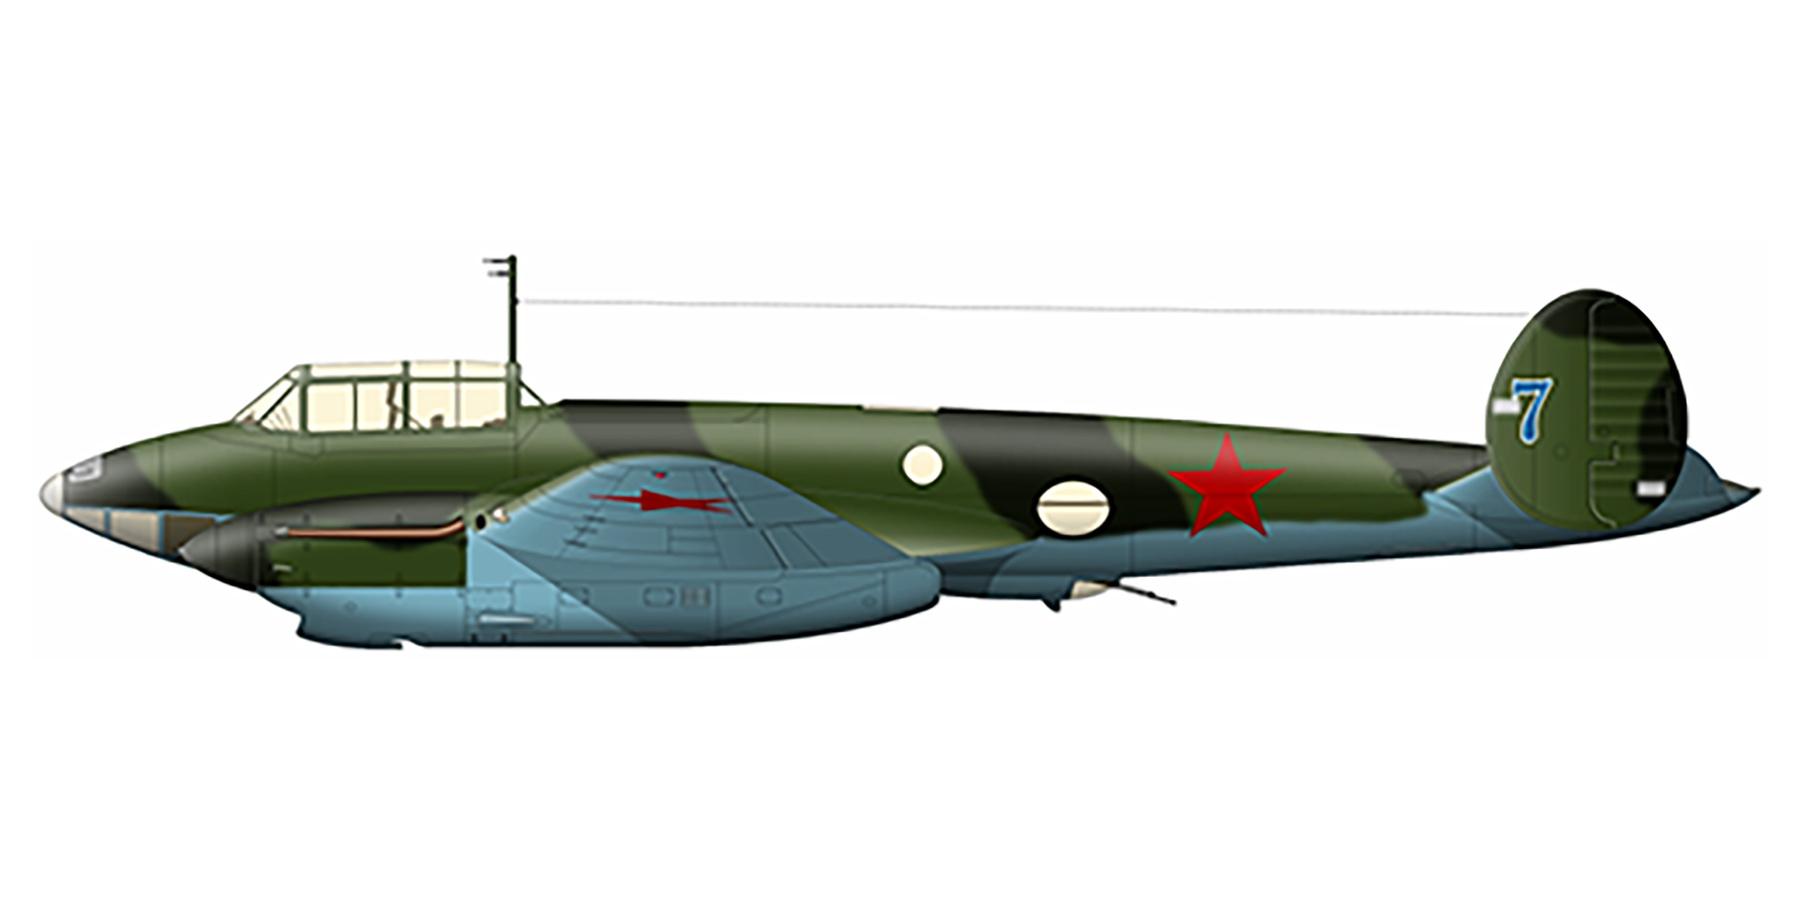 Petlyakov Pe 2 128SBAP Blue 7 Kalinin front 1943 0A